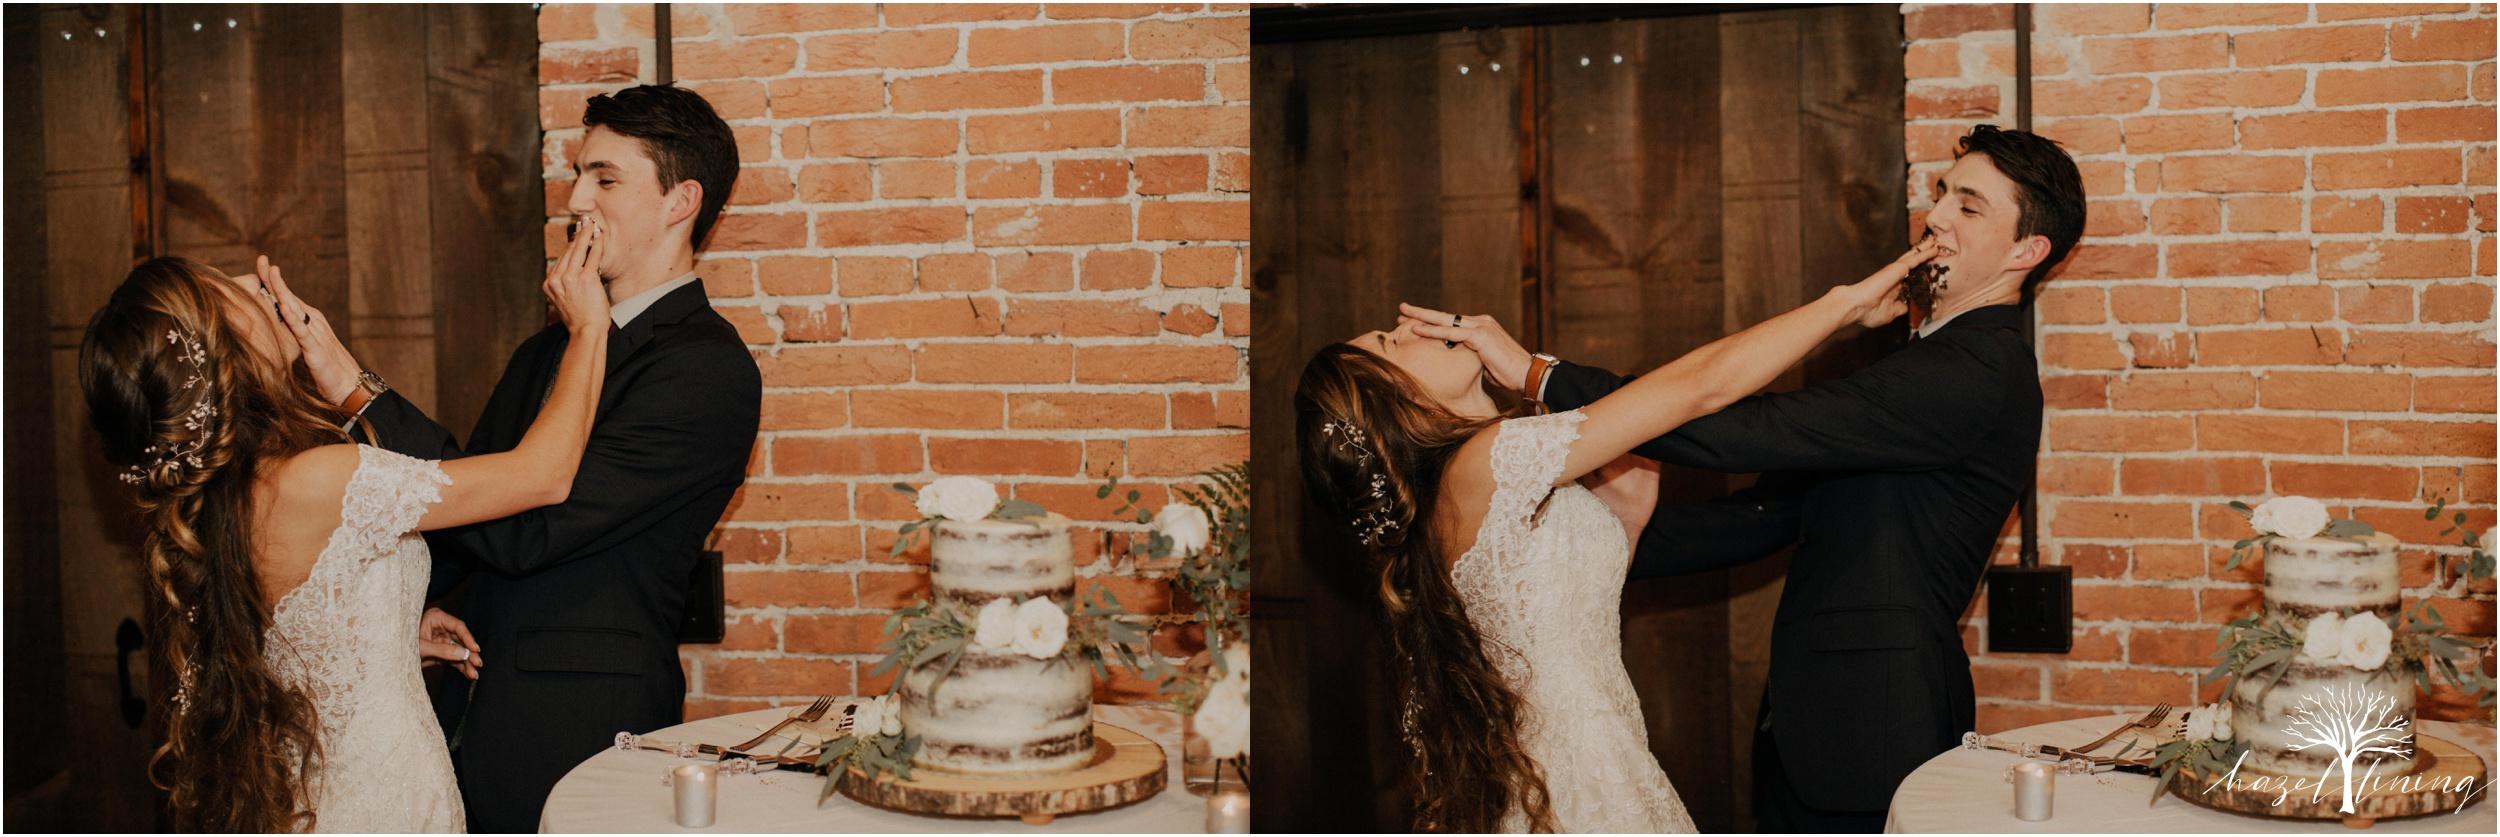 emma-matt-gehringer-the-booking-house-lancaster-manhiem-pennsylvania-winter-wedding_0165.jpg